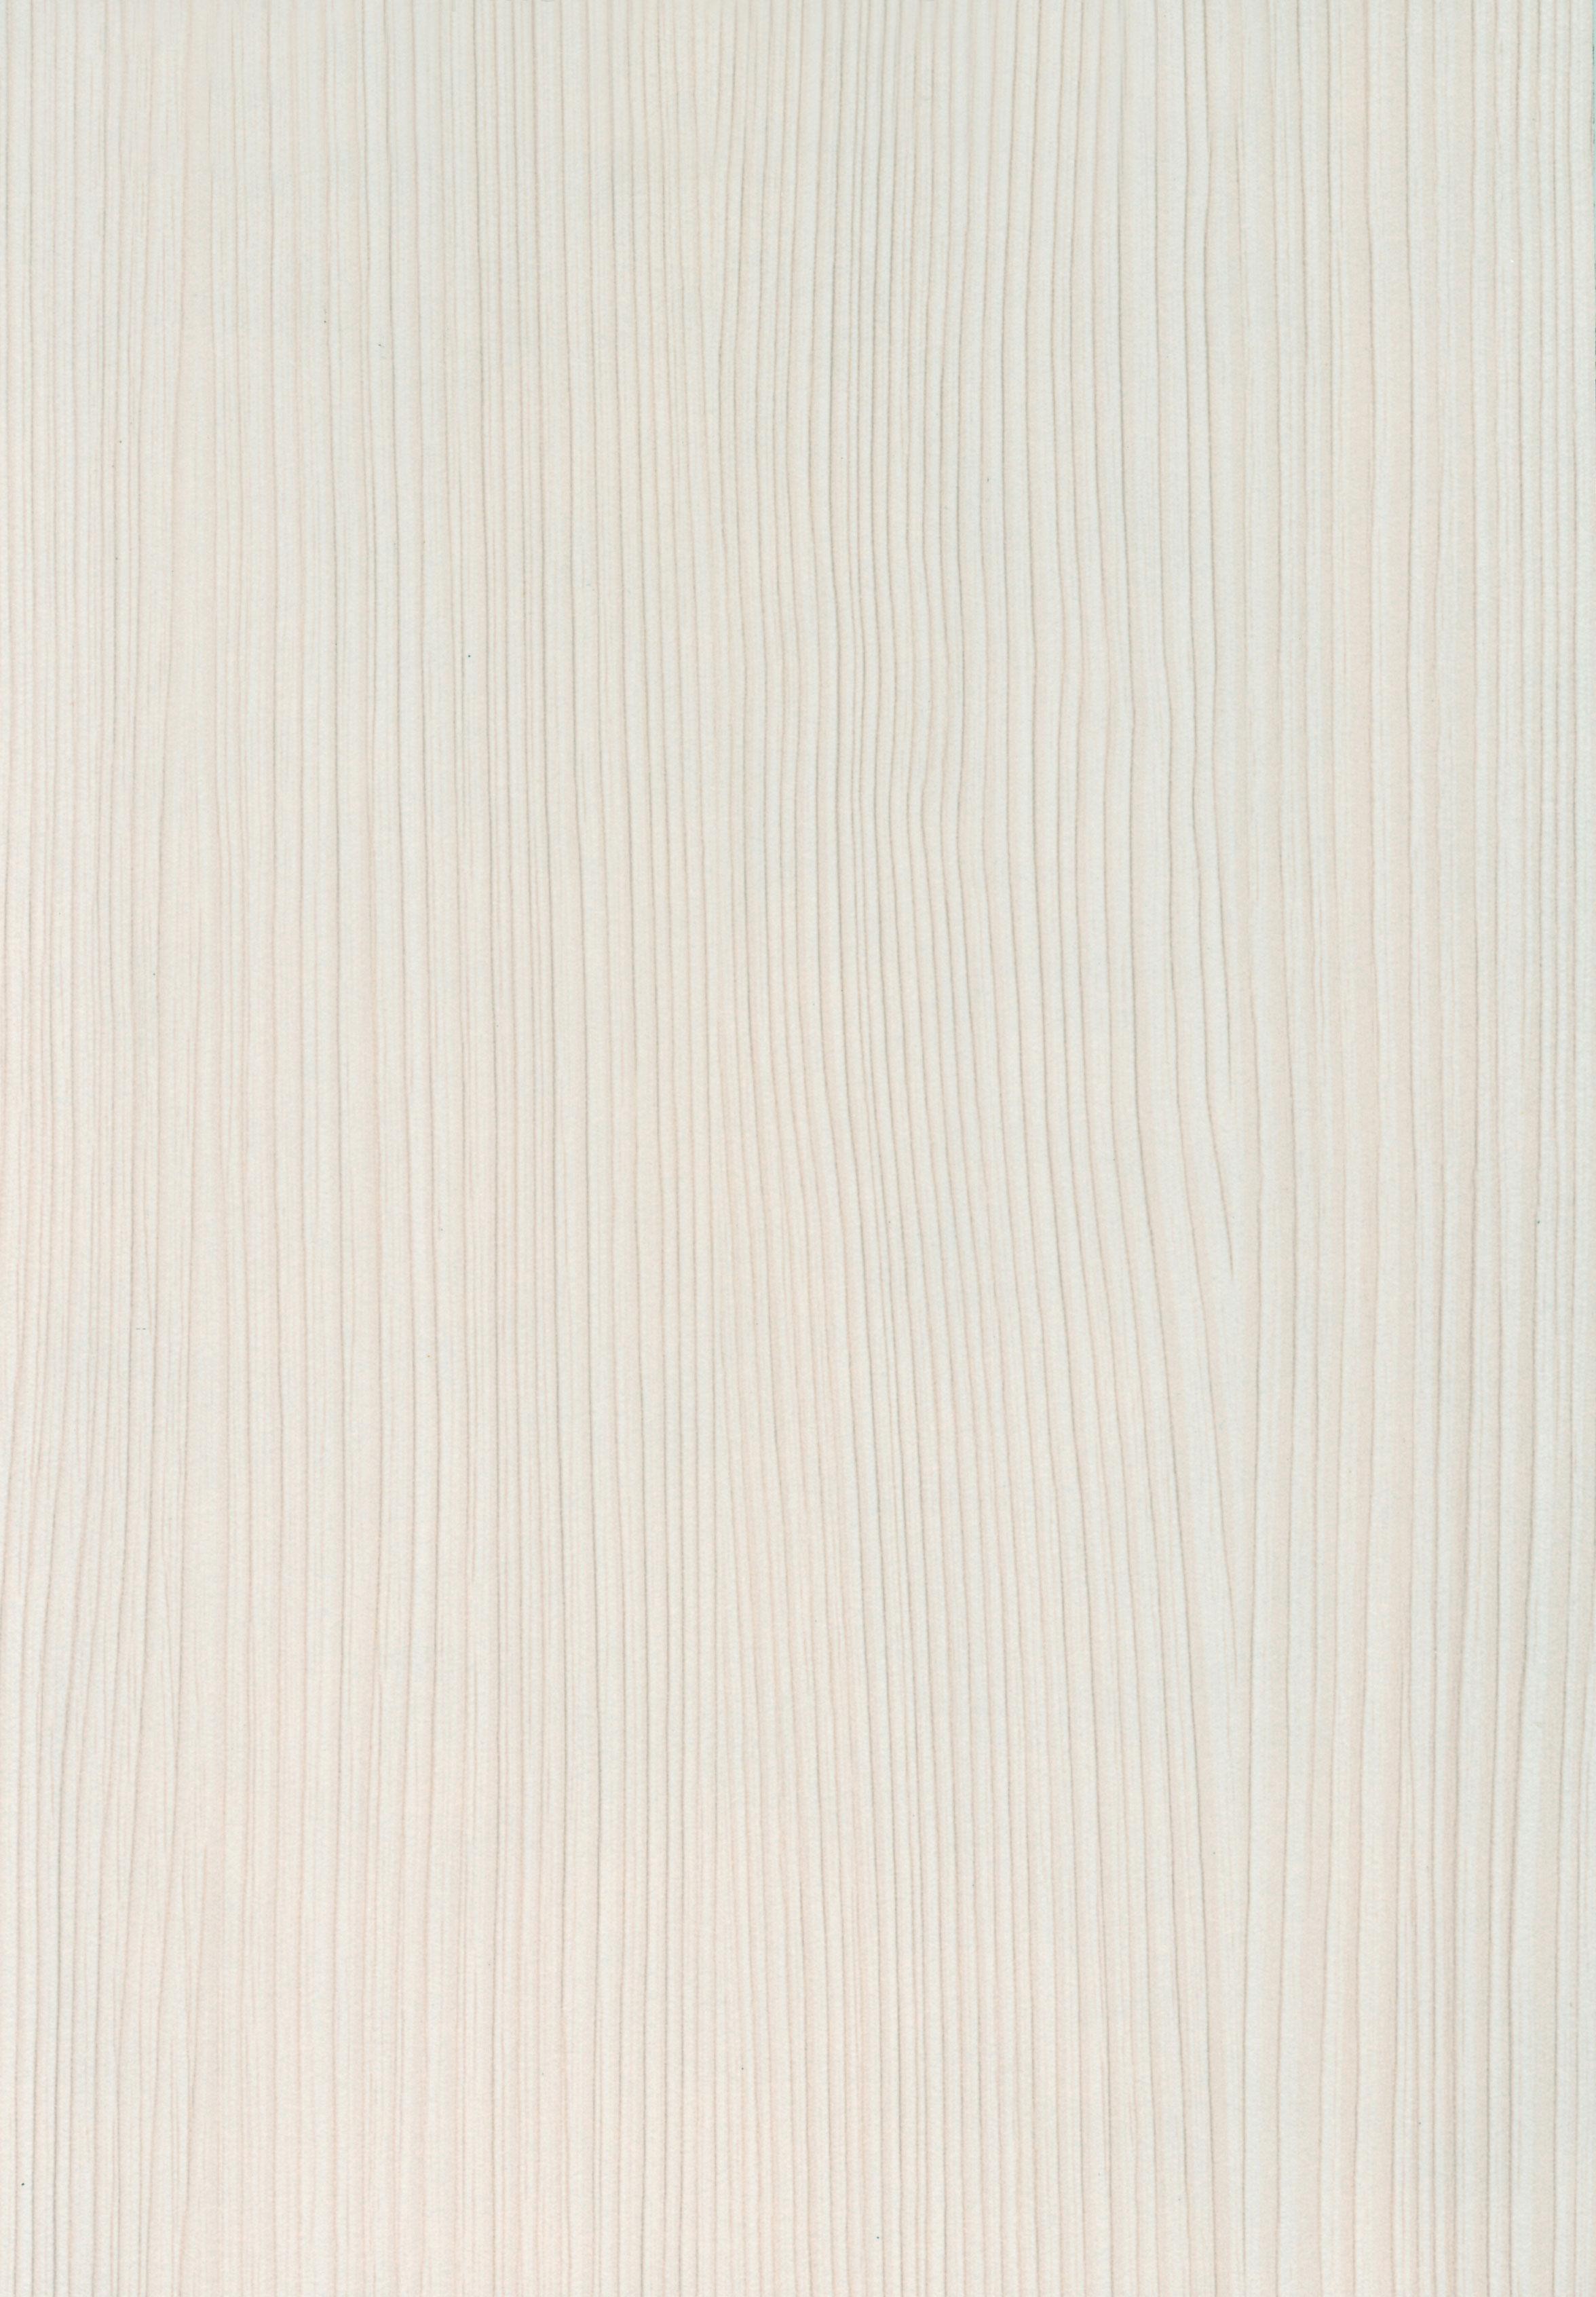 EWC 8328 S - Light Creme Woodgrain High Pressure Laminate (hpl)